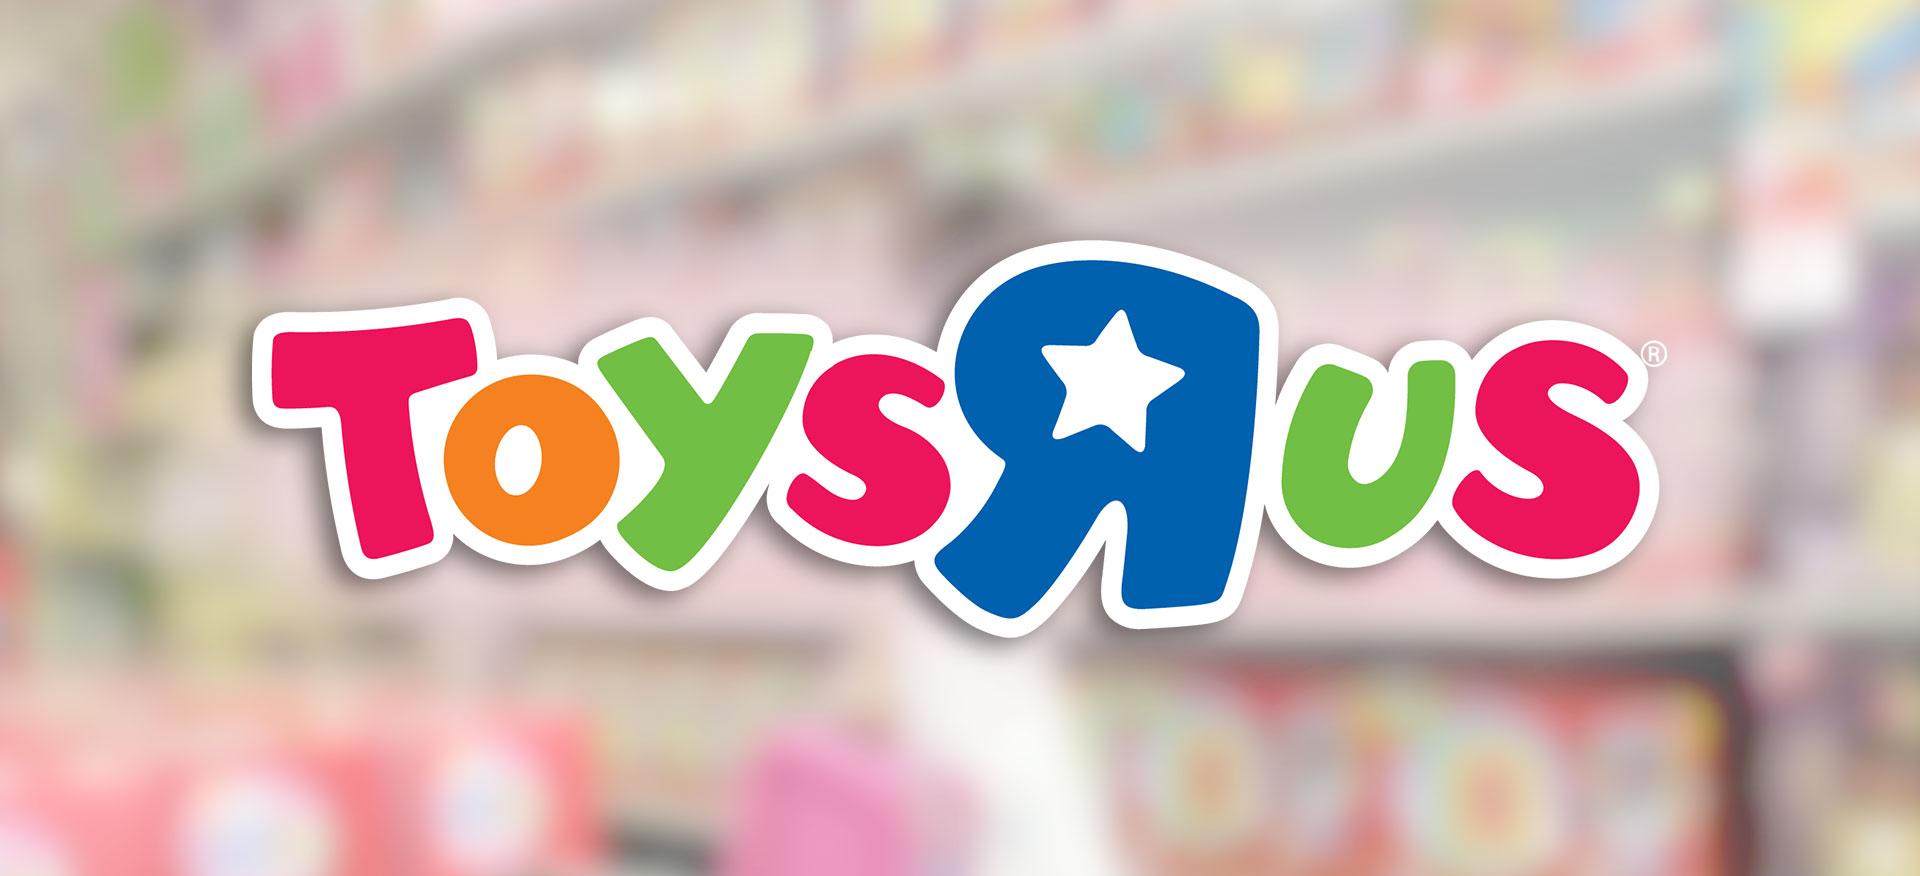 KELO Toys R Us Logo